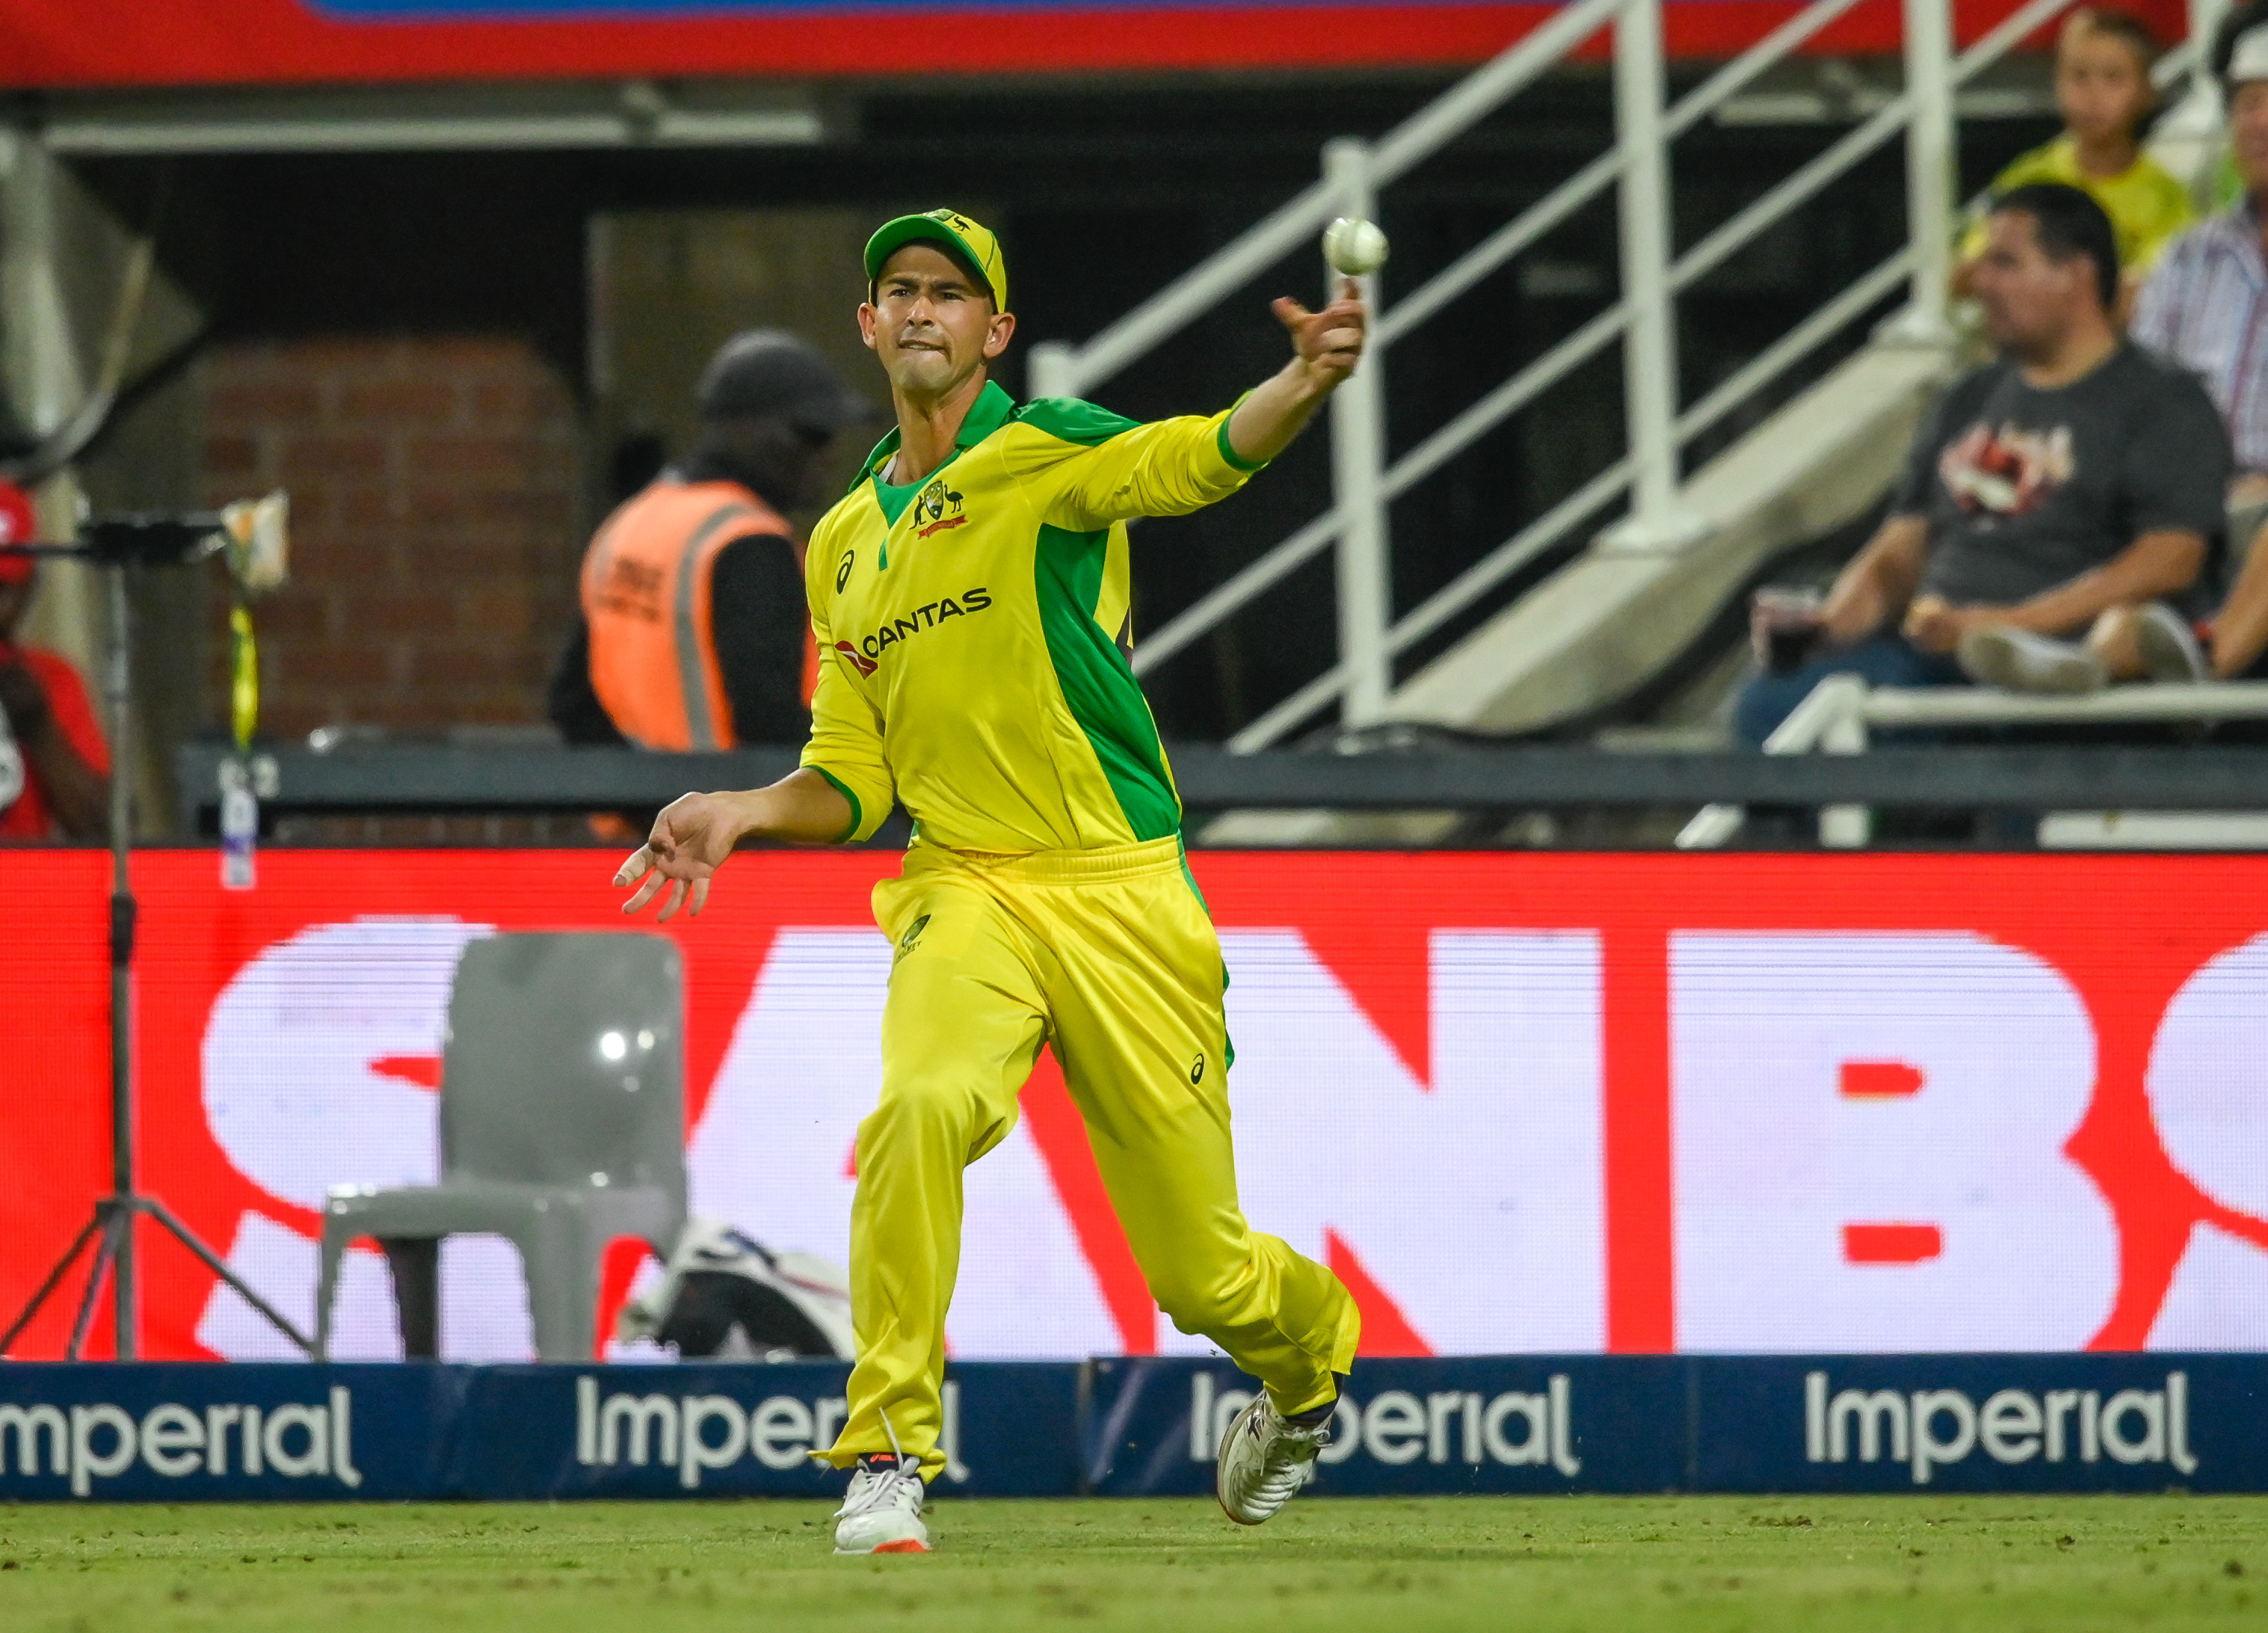 ICC rankings Ashton Agar bursts into top five as Australia players make big moves 27 Feb thumbnail